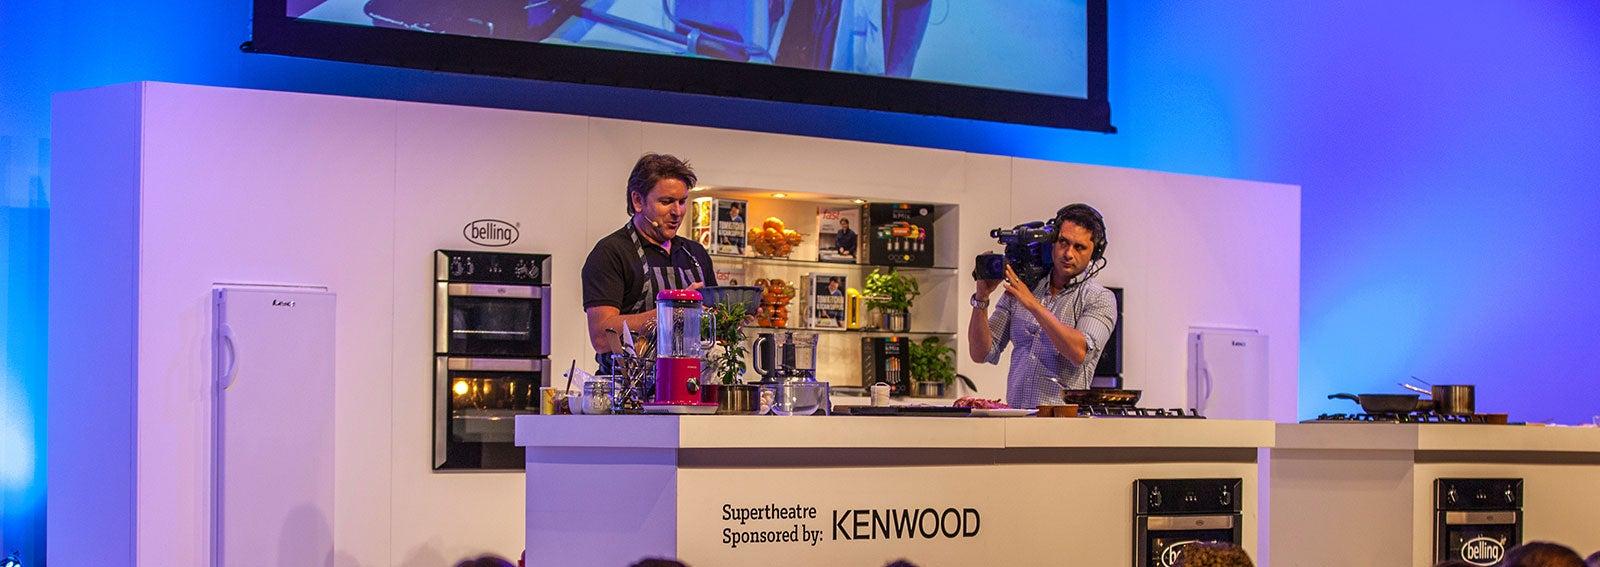 good-food-show-2014-37_1600x567.jpg